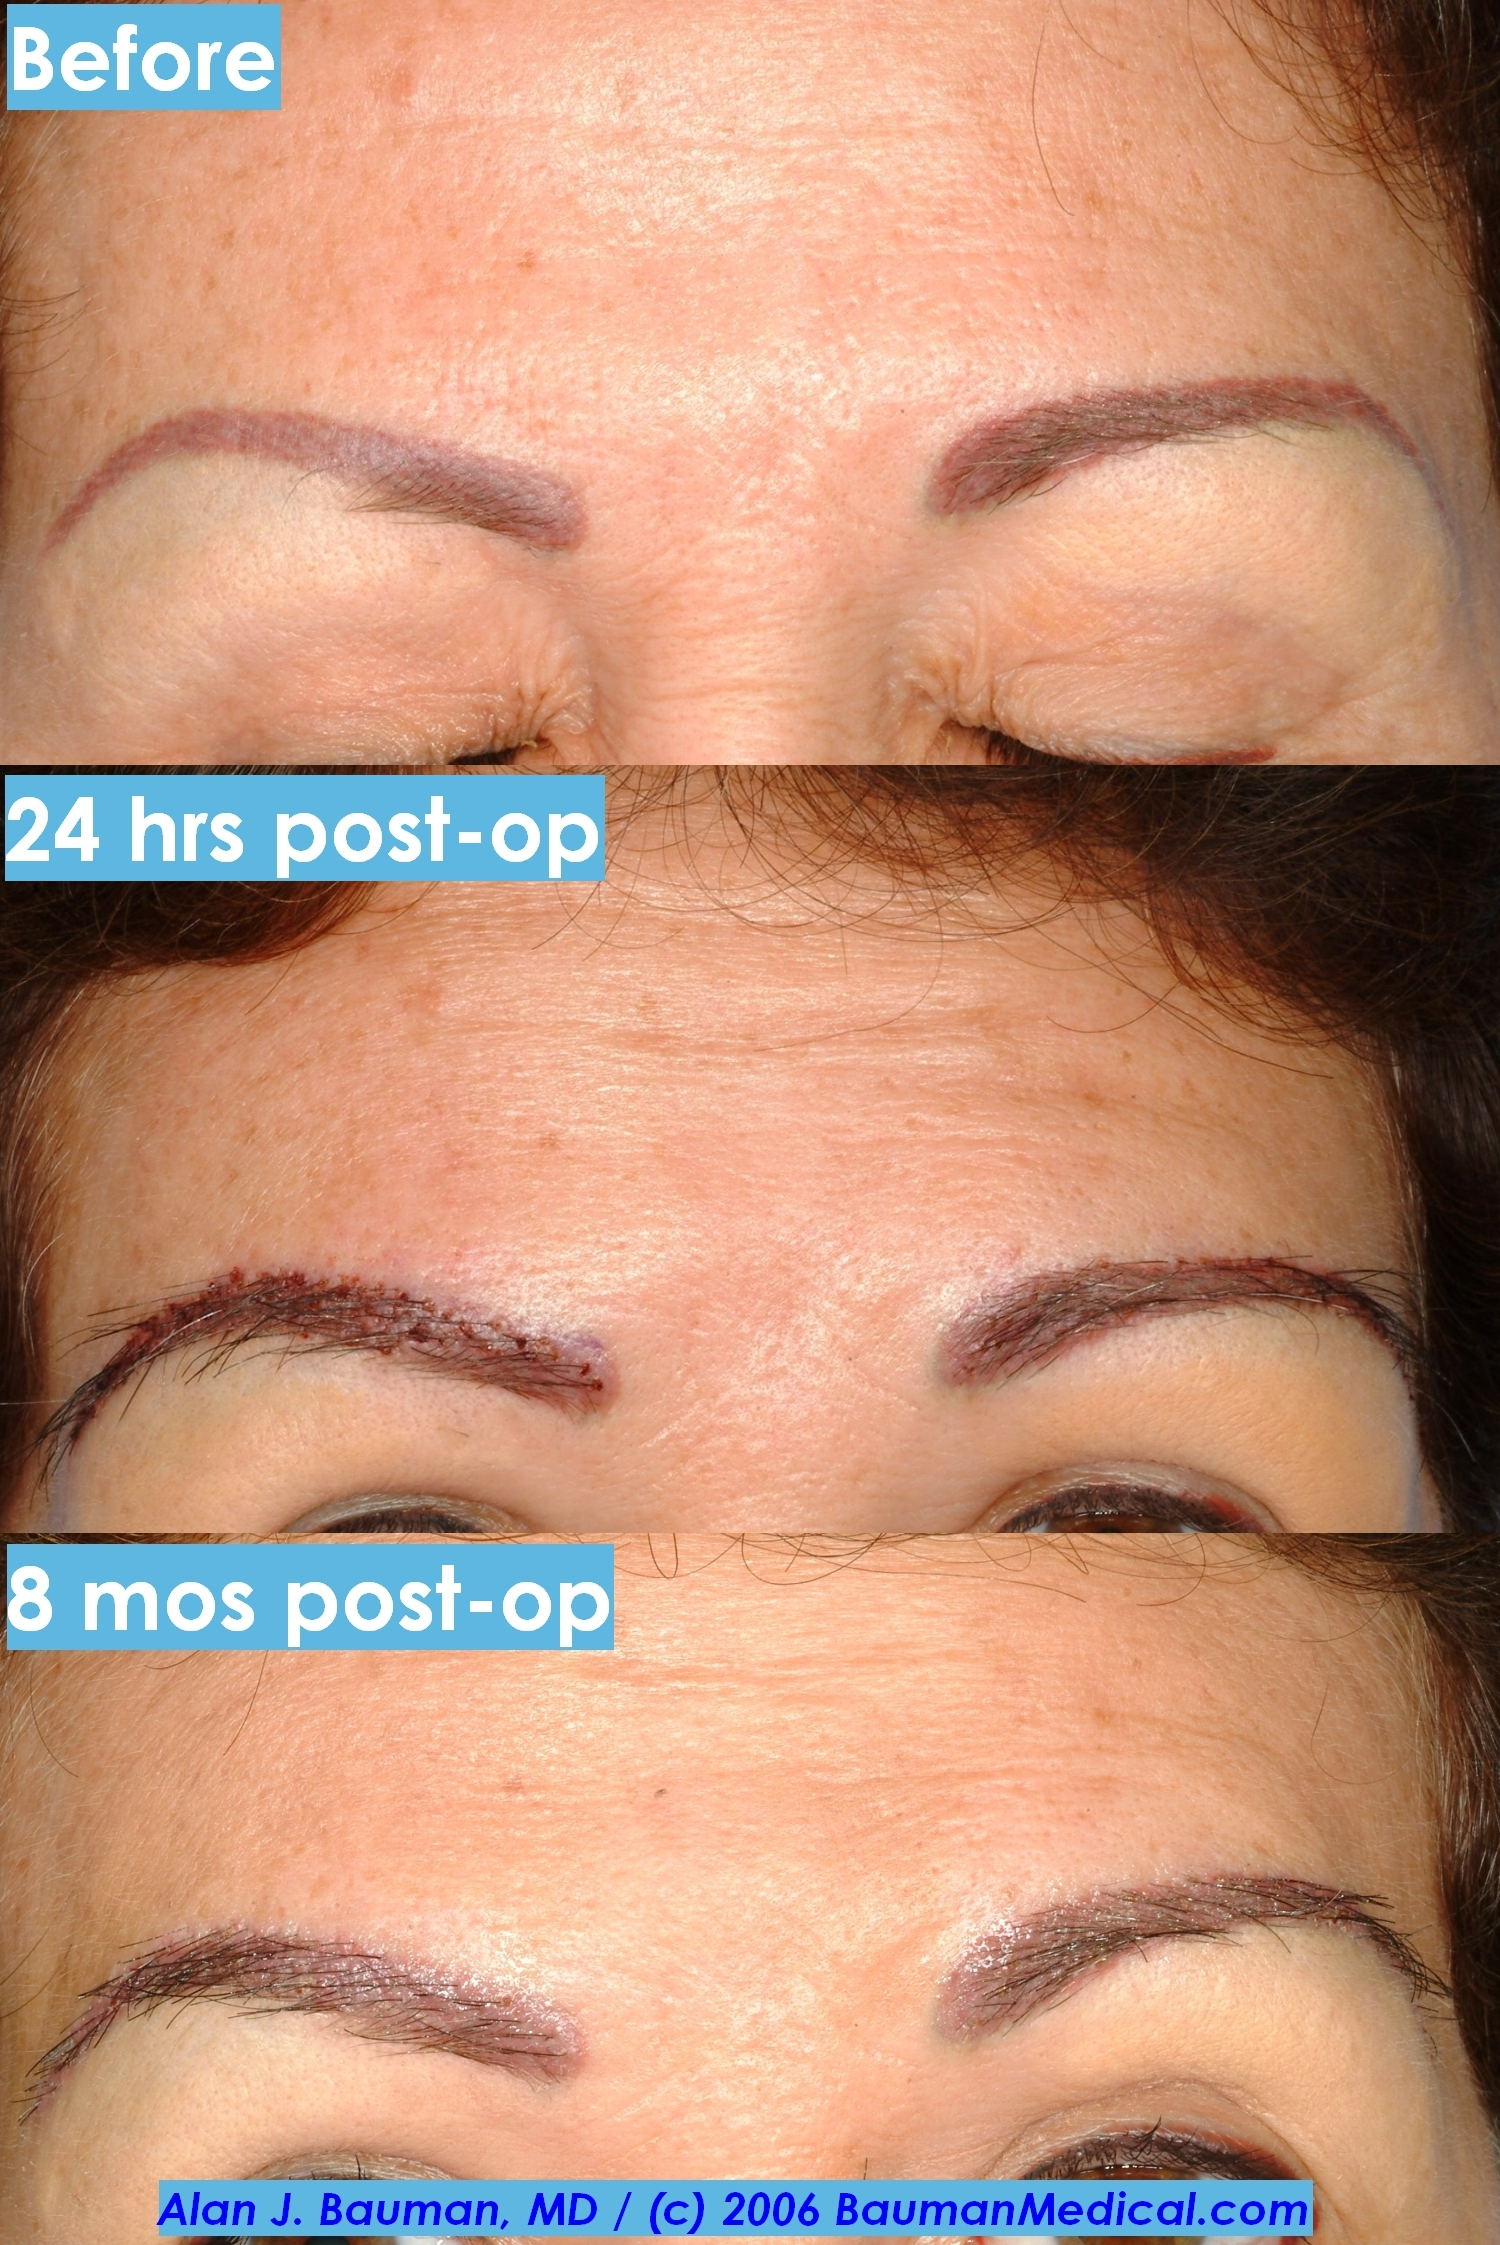 eyebrow%203 vert%20logo lg Eyebrow Scar Hair Transplant